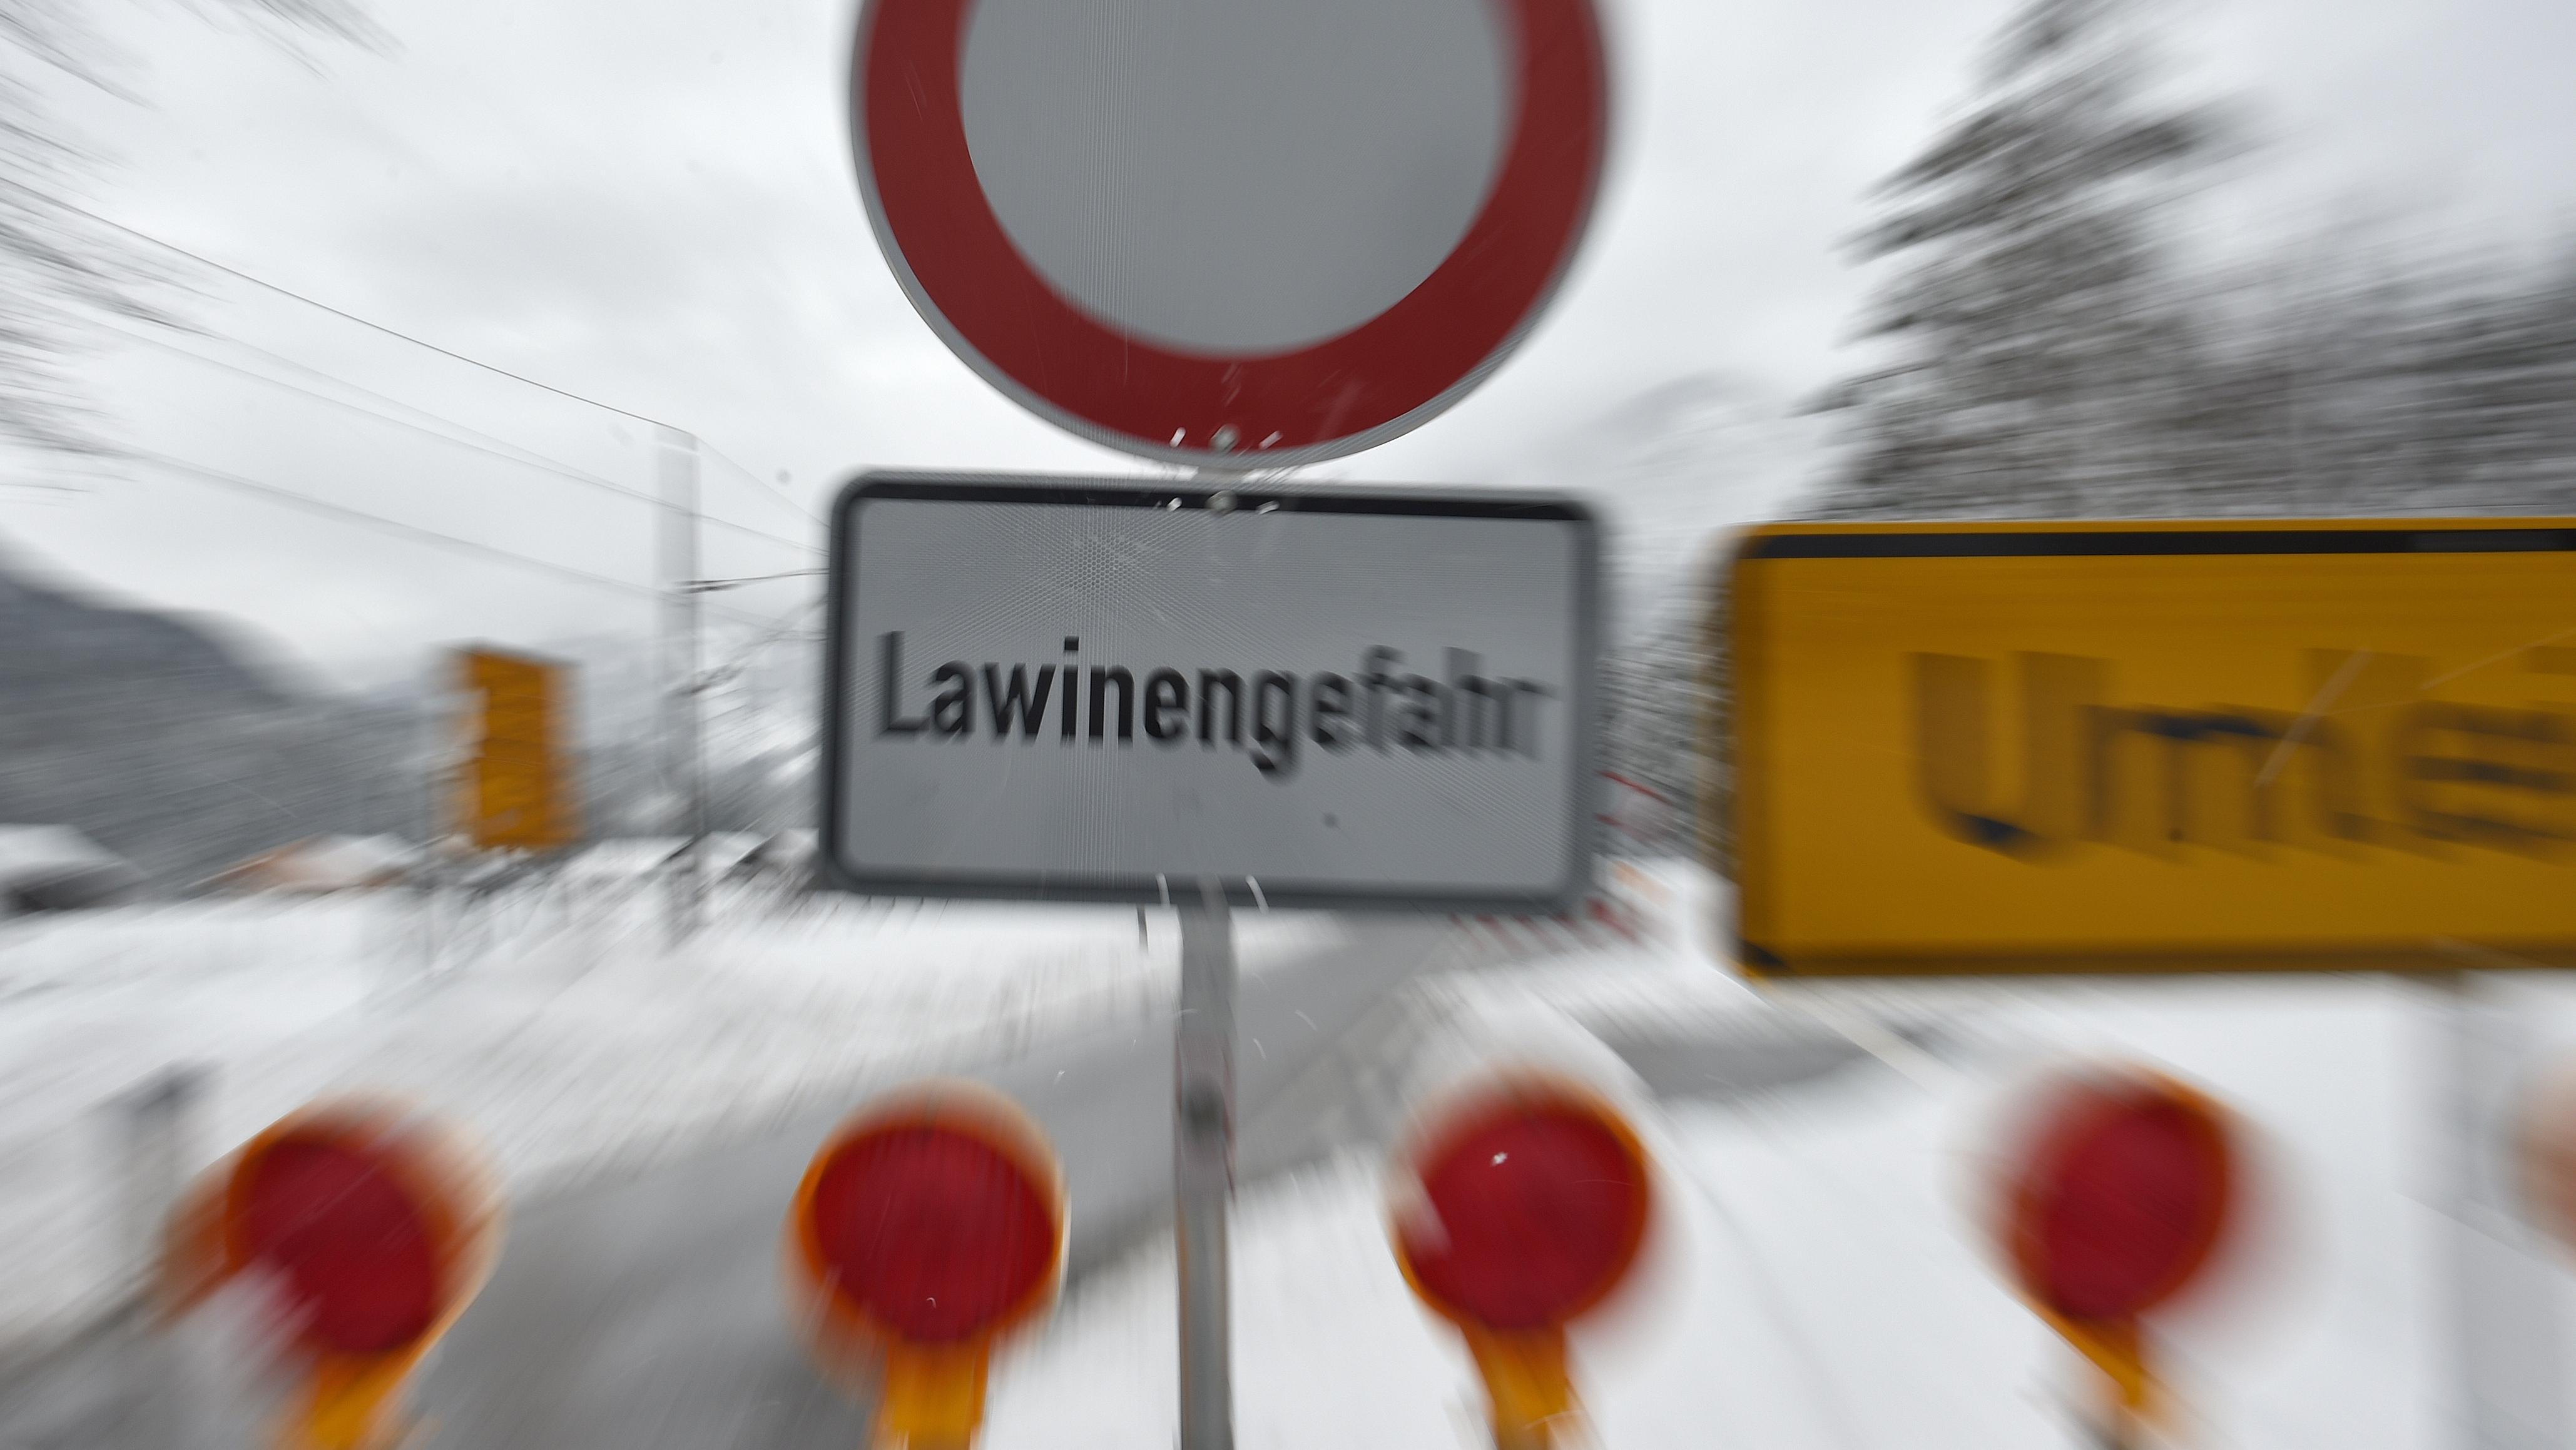 Straßensperrung wegen Lawinengefahr